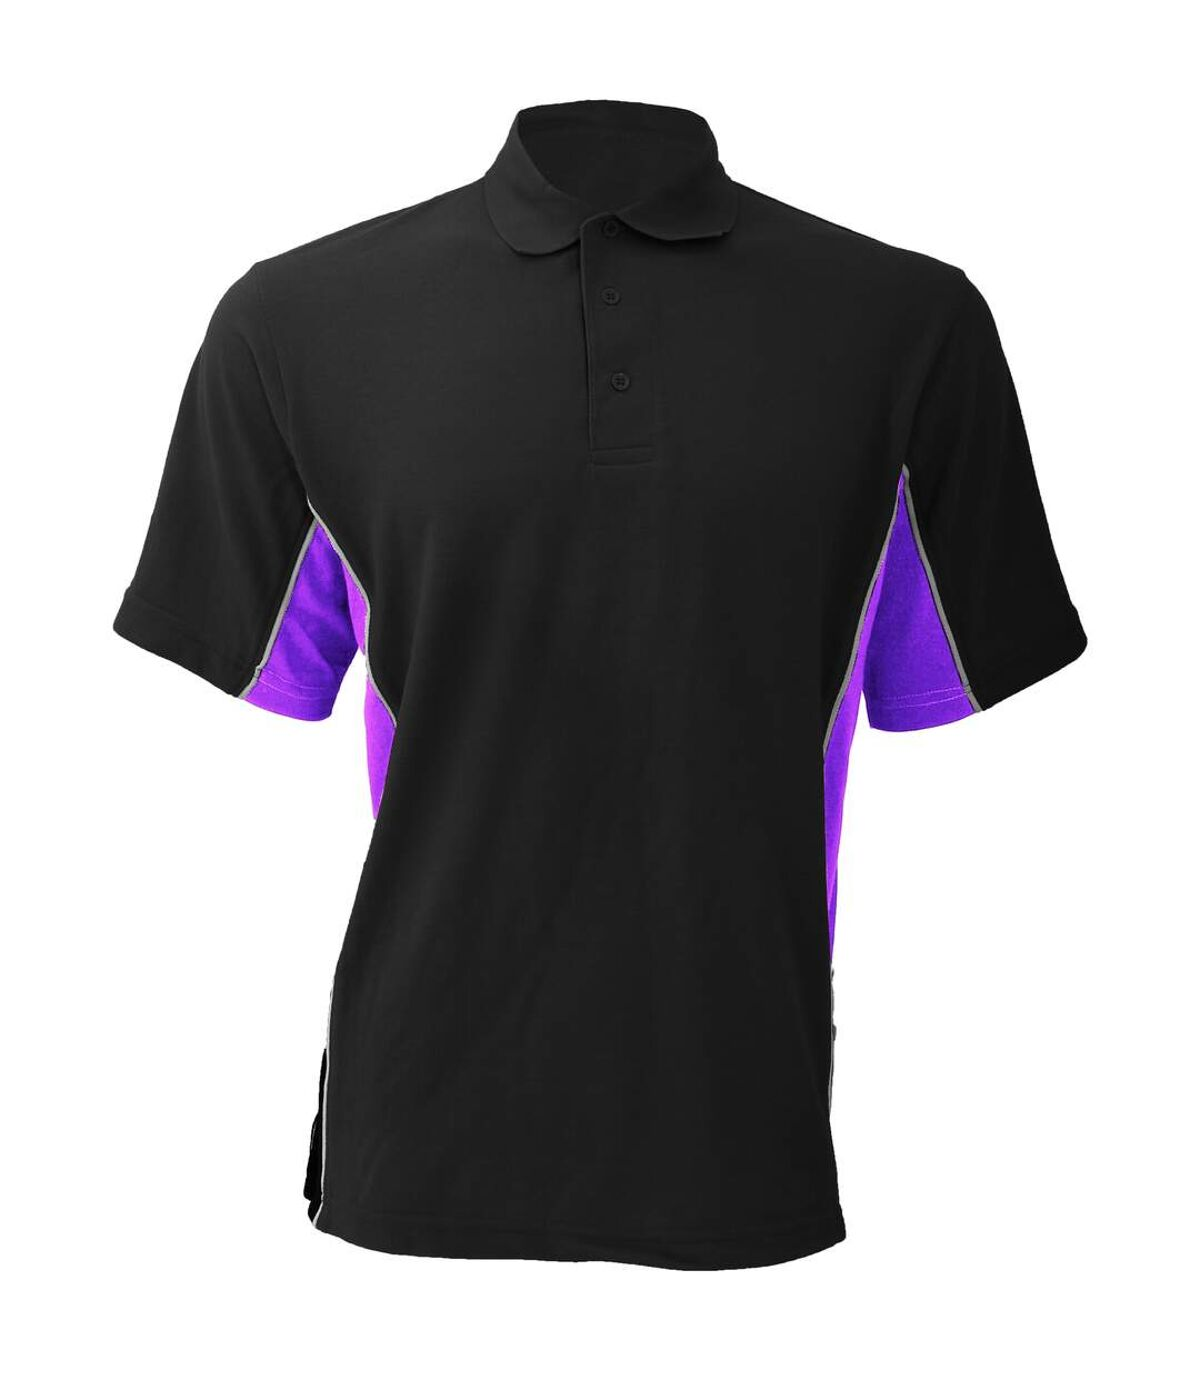 Gamegear® Mens Track Pique Short Sleeve Polo Shirt Top (Black/Orange/White) - UTBC412